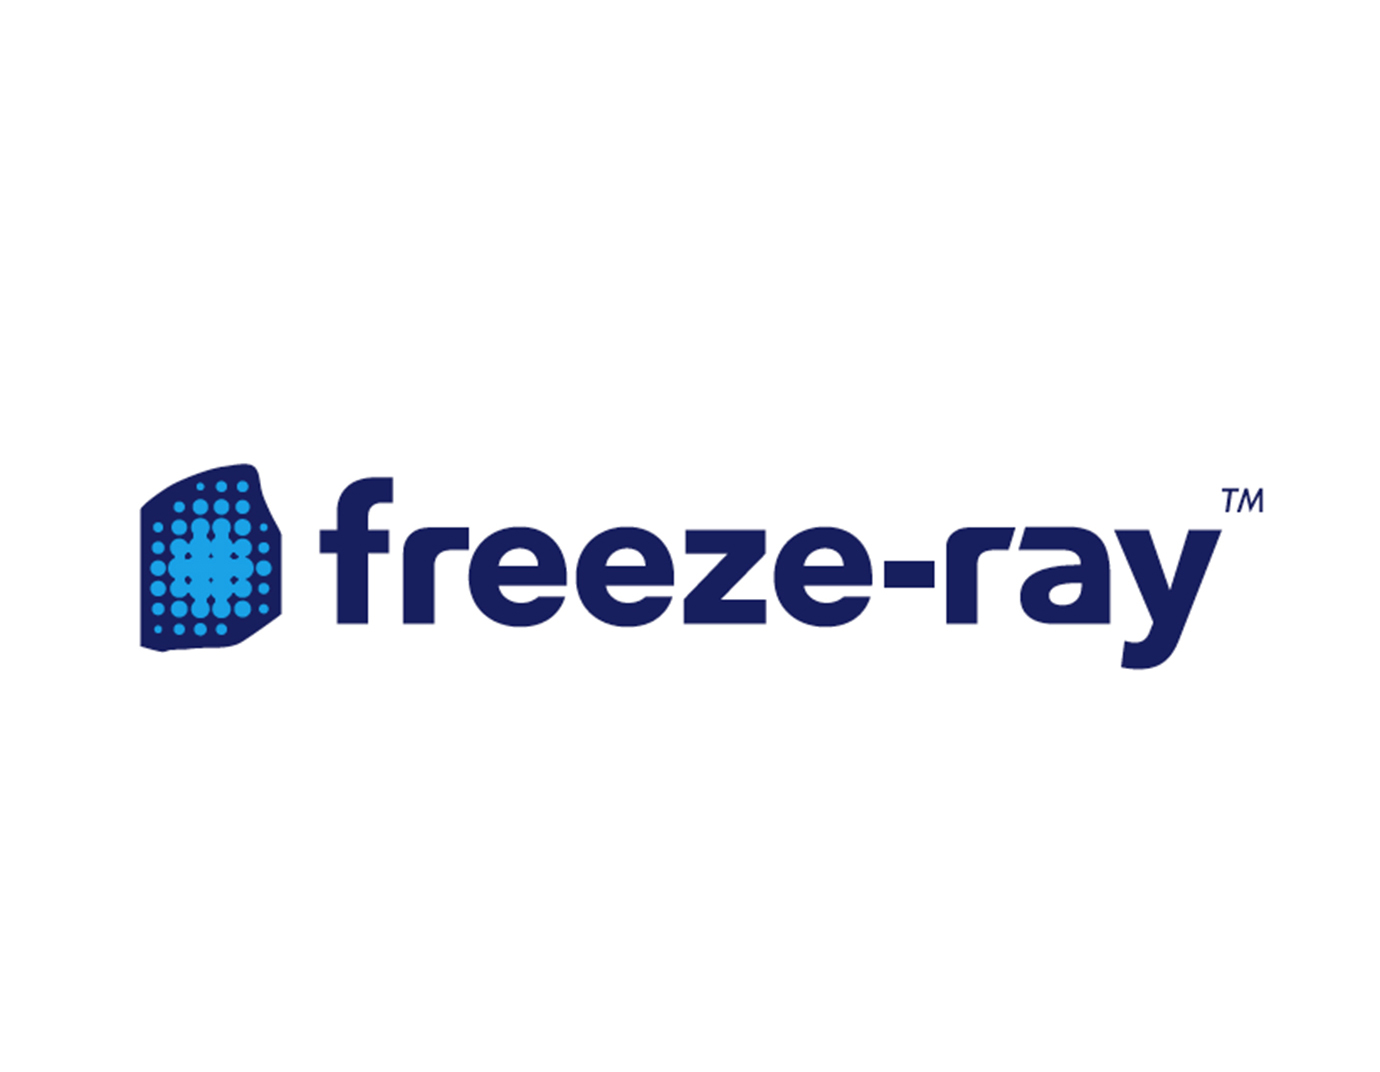 Freeze-Rayロゴマーク